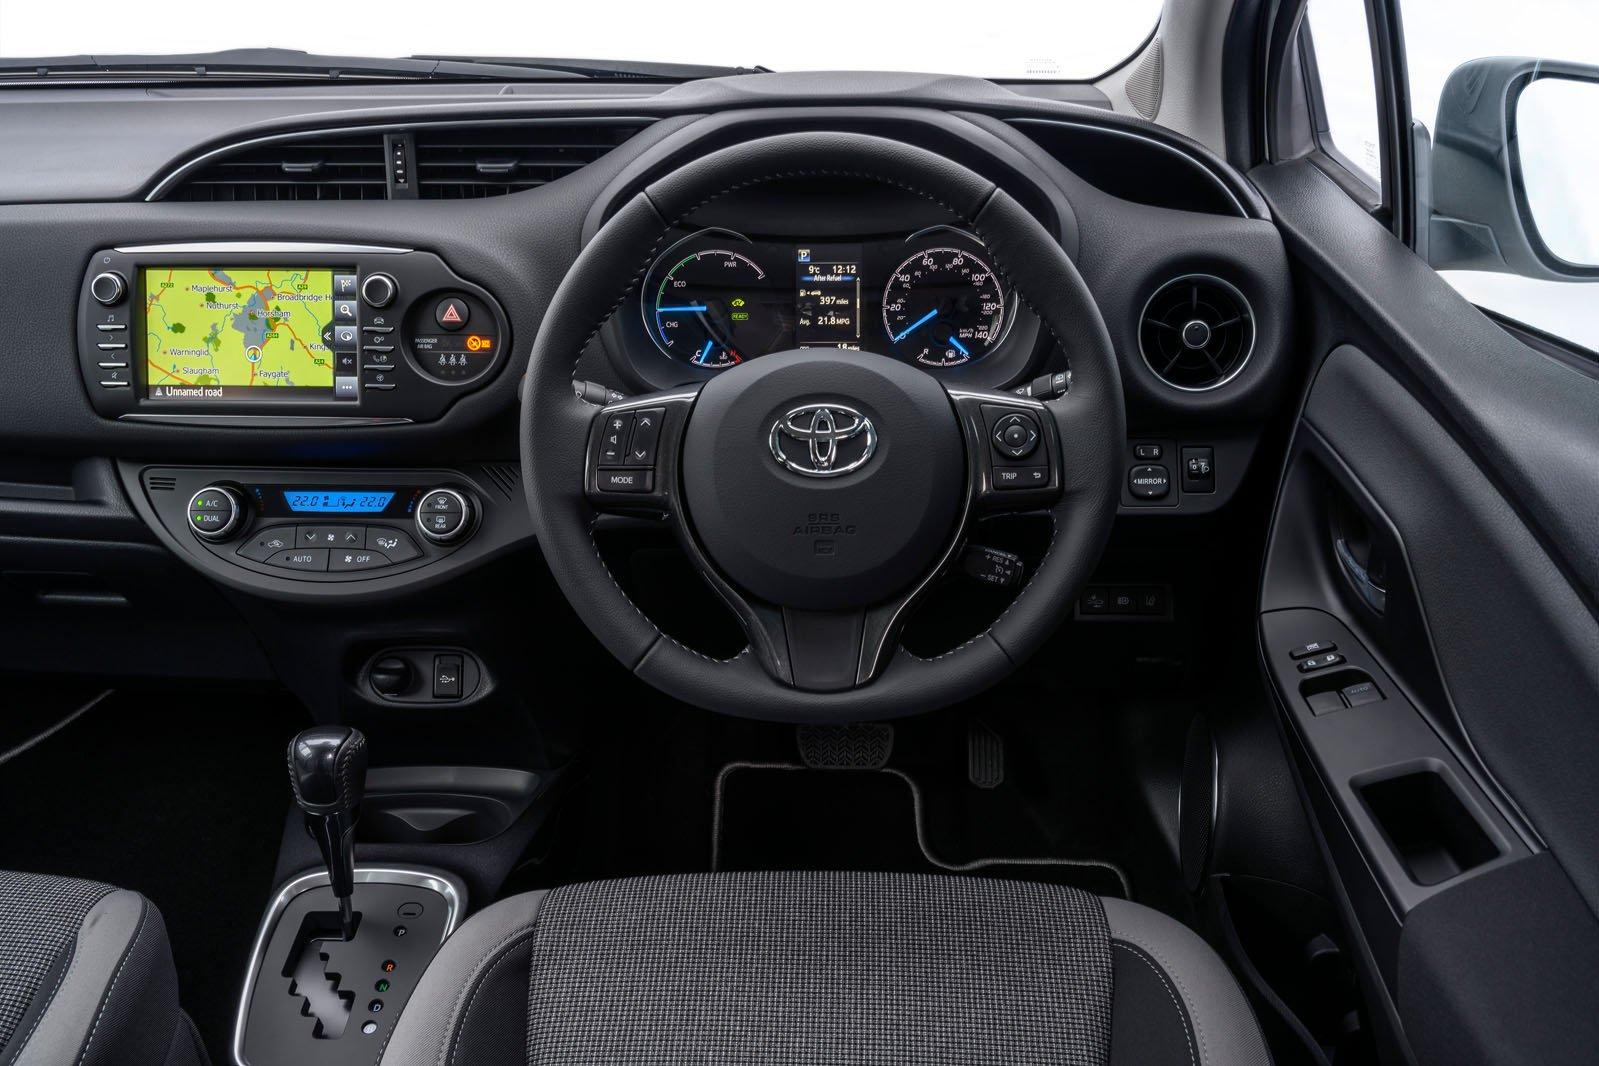 Toyota Yaris 1.5 Hybrid Icon CVT auto - interior